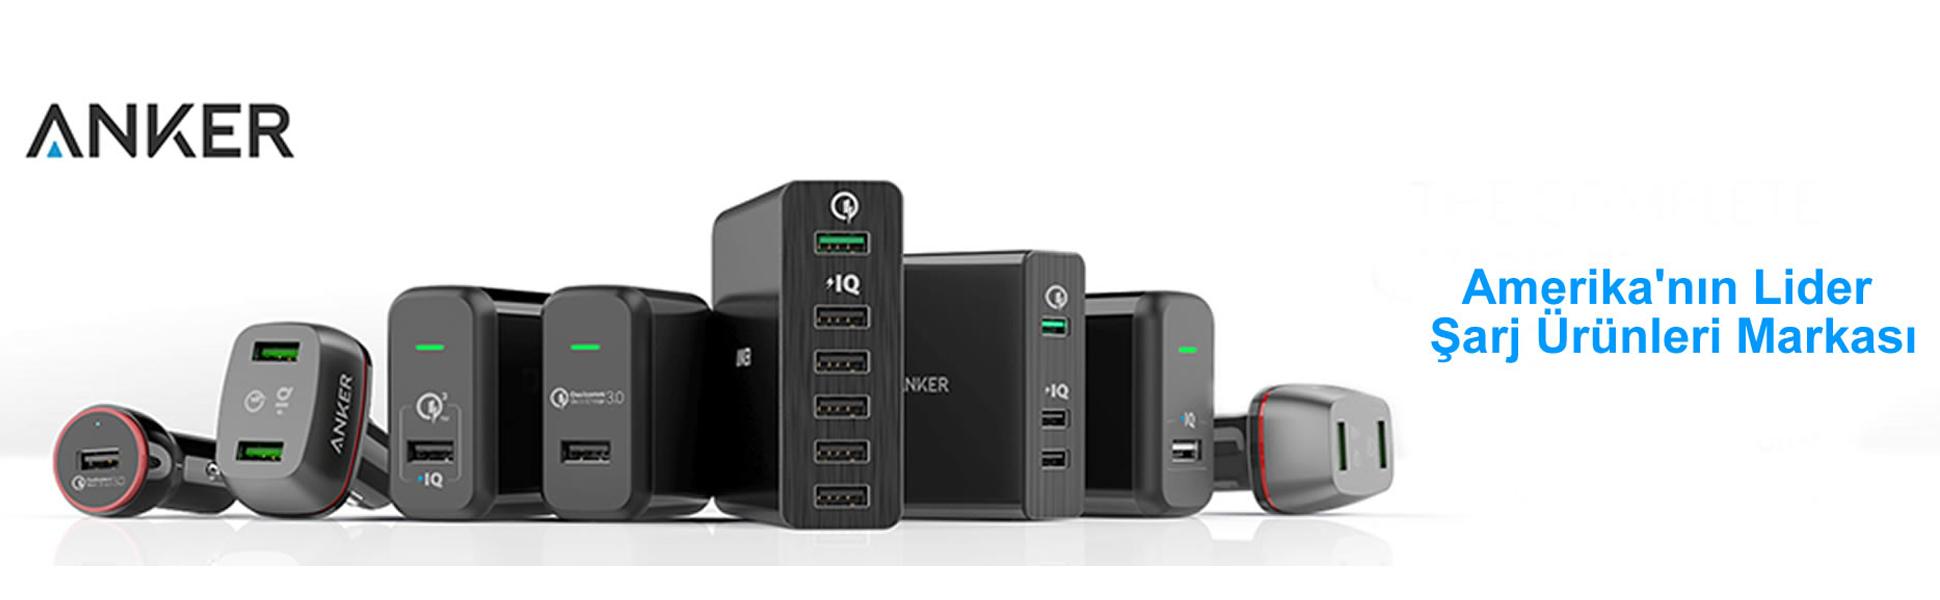 Anker Ergonomik Dikey Kablosuz Mouse Wireless Fiyatı